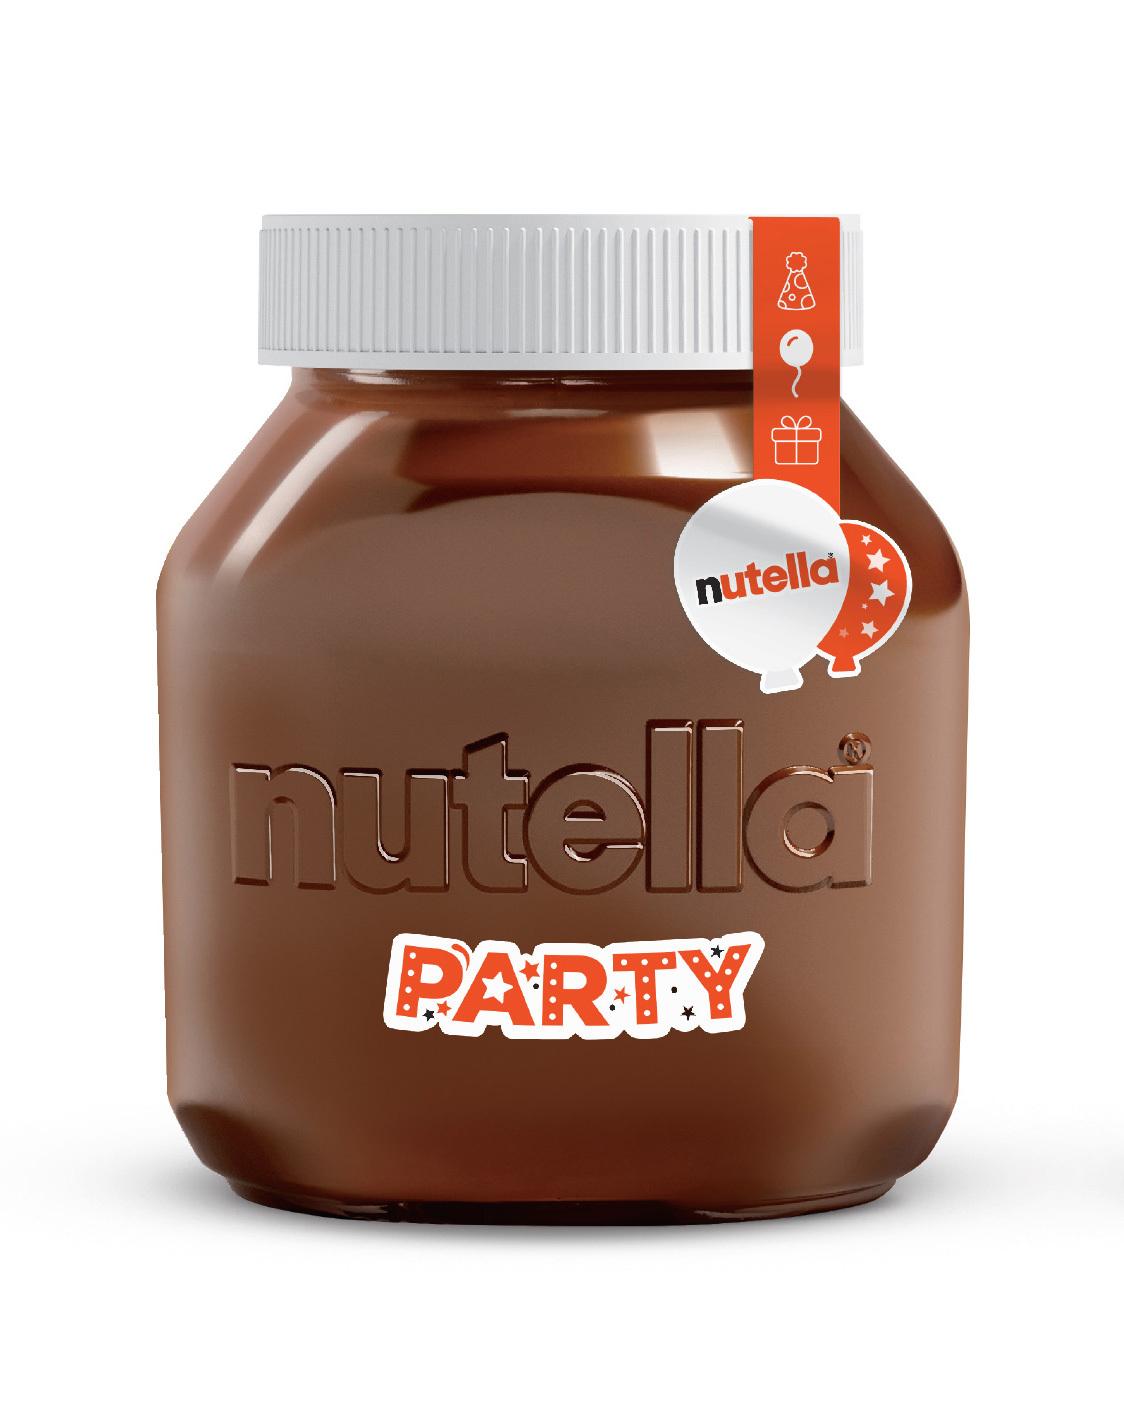 Ореховая паста Nutella, фундук и какао, Party edition, 3кг